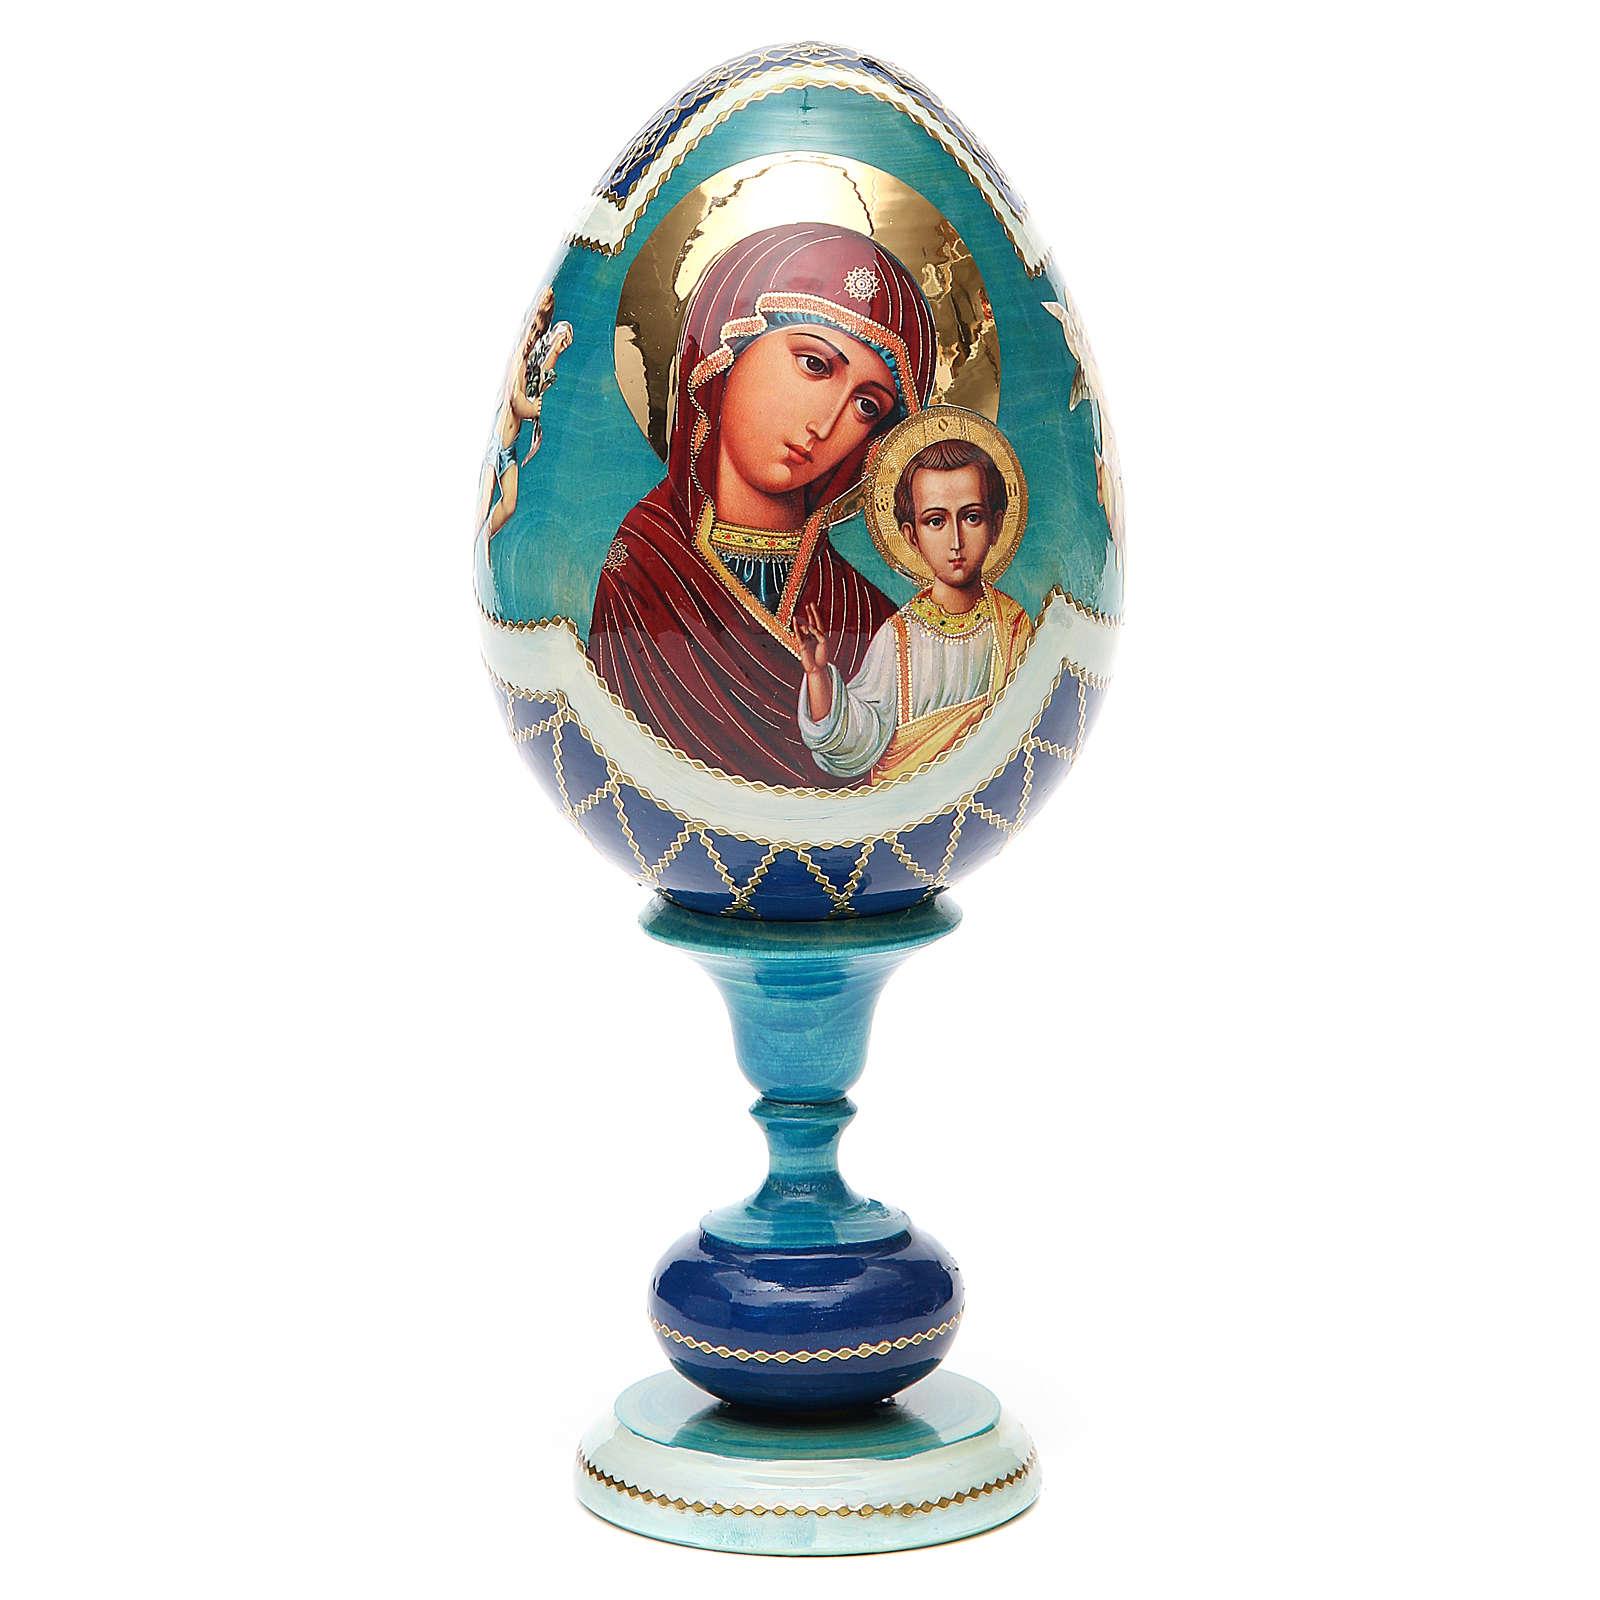 Oeuf bois découpage russe Kazanskaya h 20 cm style Fabergé 4